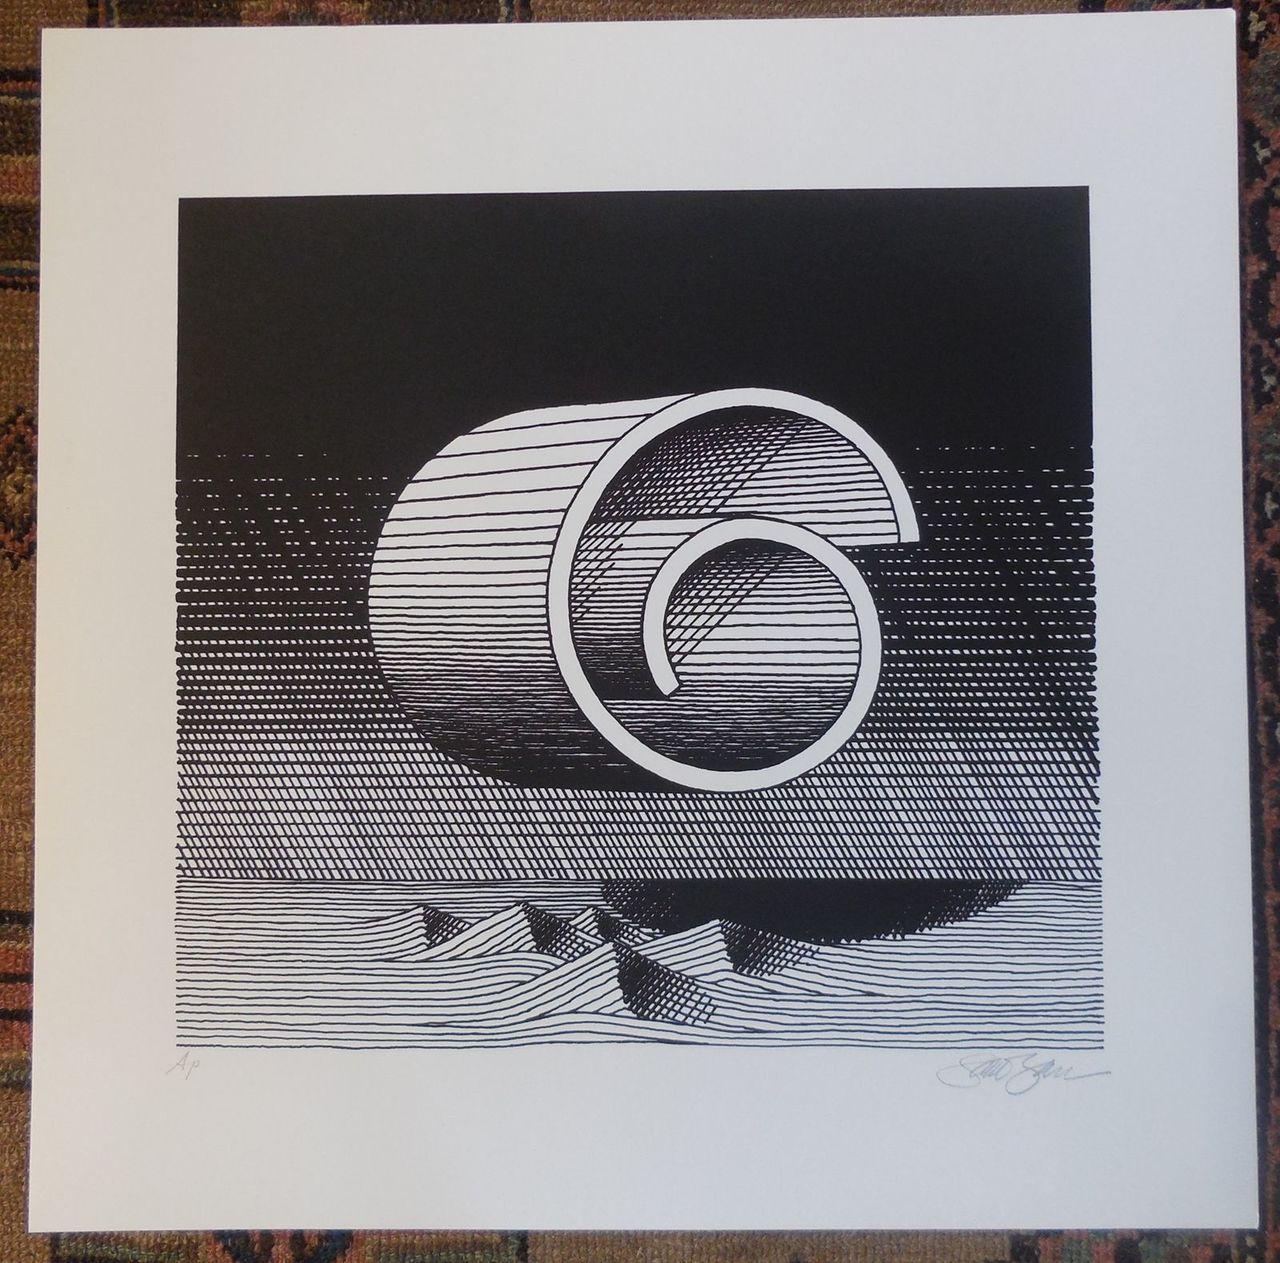 CALENDARIO GRAFICO - 31 Serigraph Prints - 1978 [Signed]